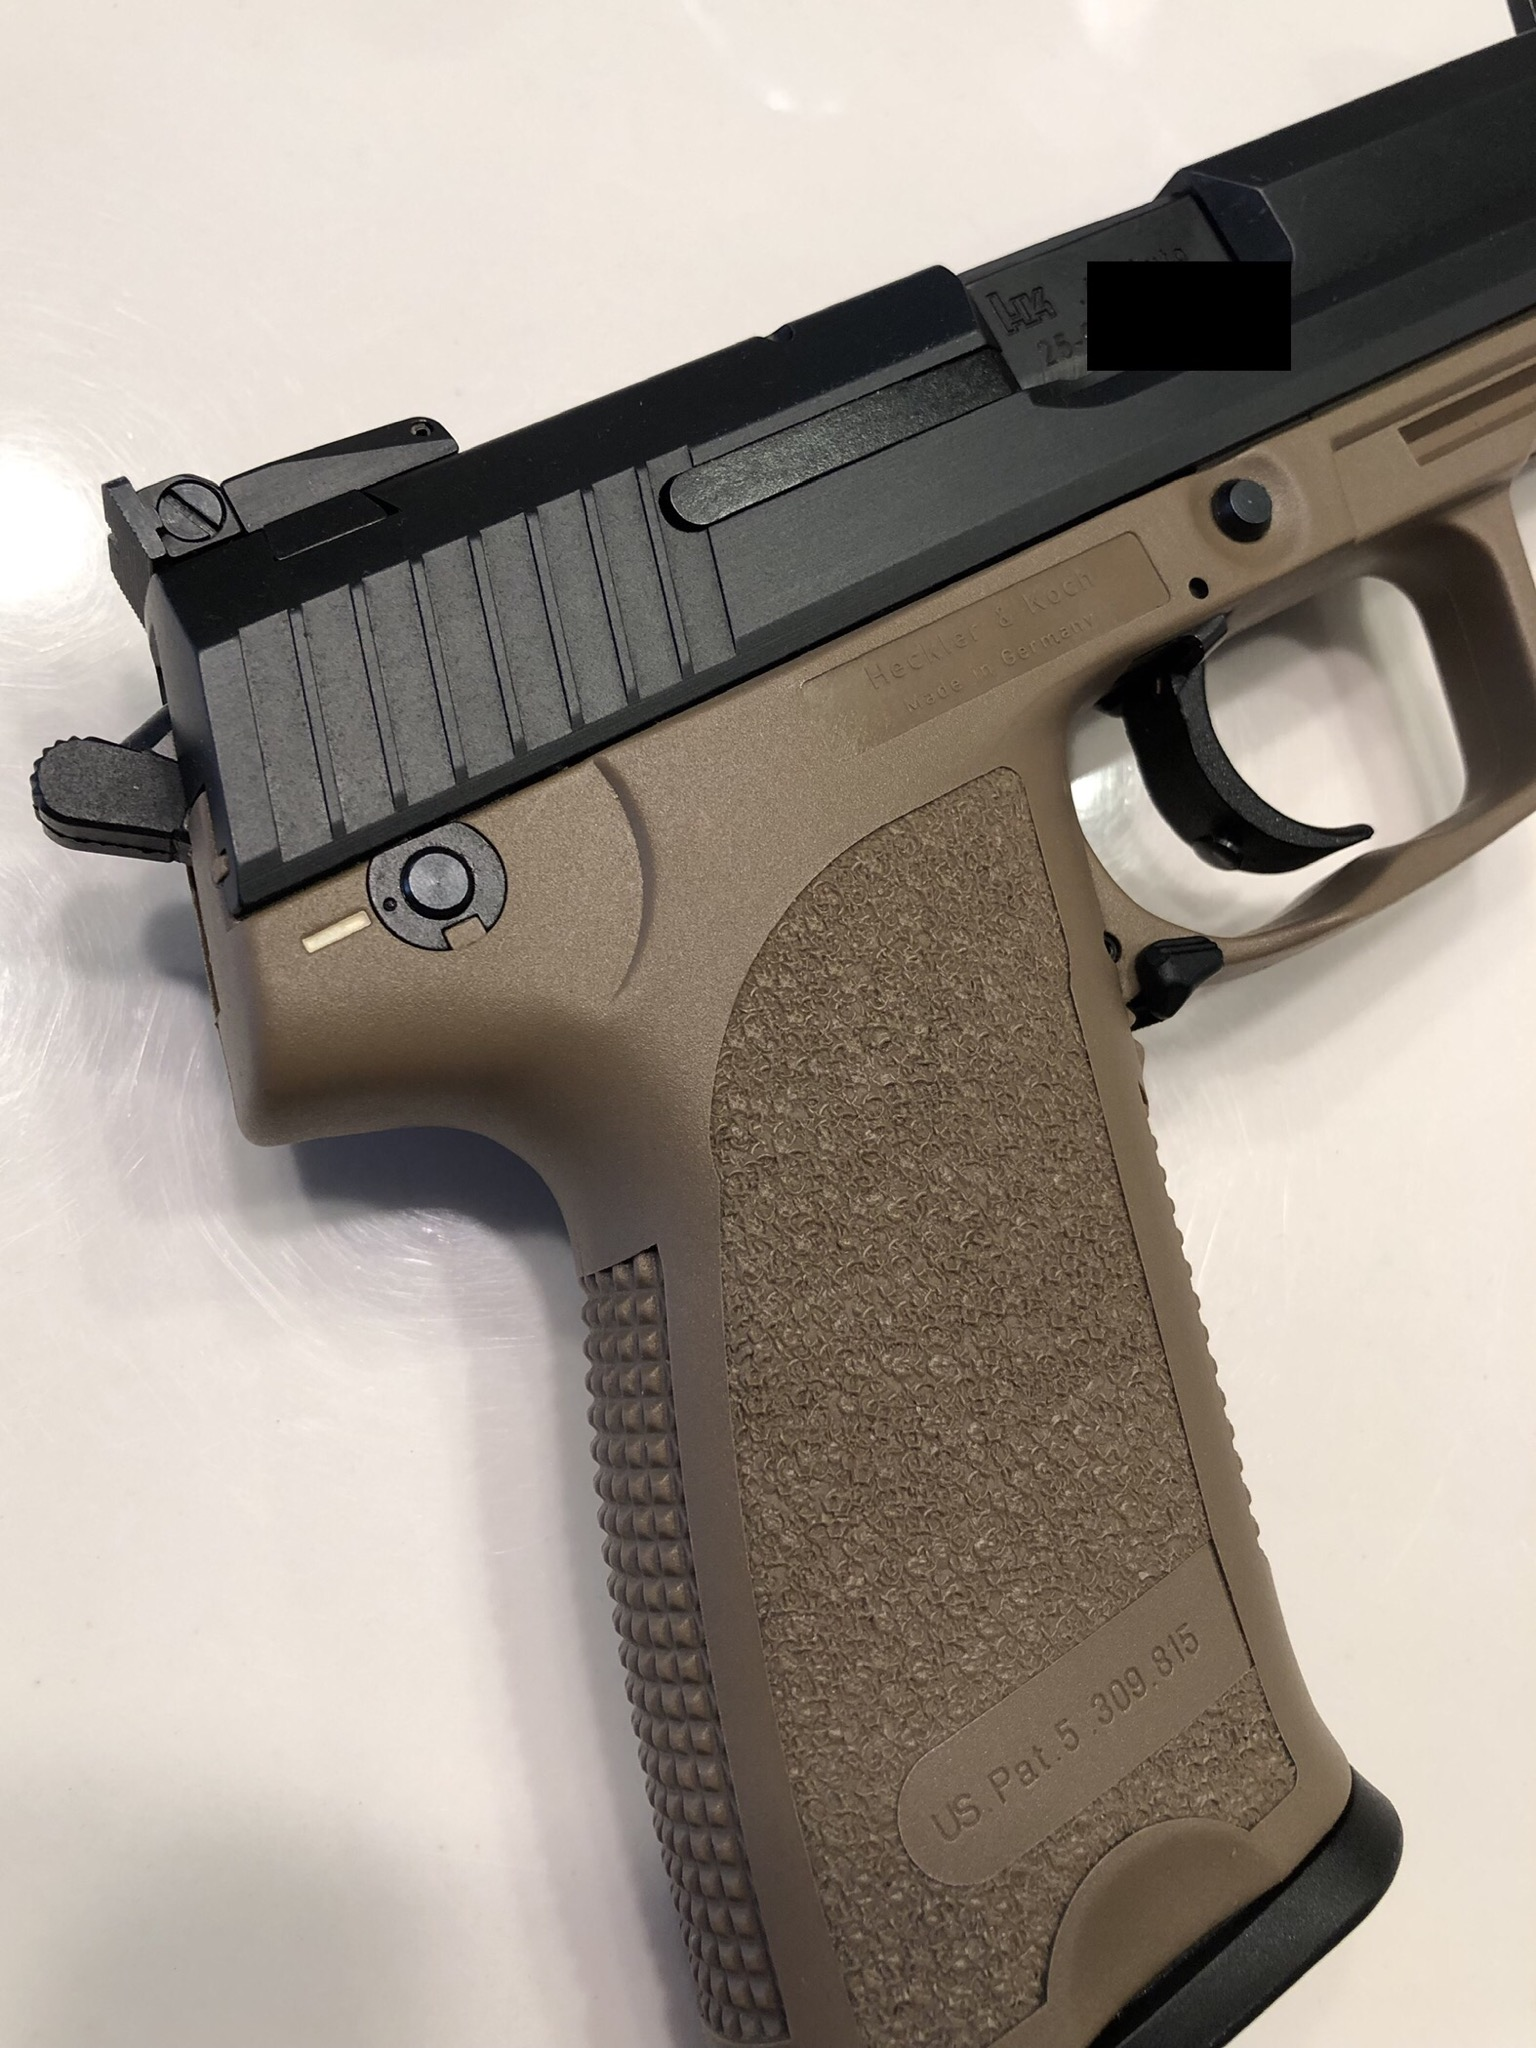 SOLD: HK USP .45 Tan Tactical (FDE)-62b2a75d-3ad2-4663-83e1-52edc729df65.jpeg